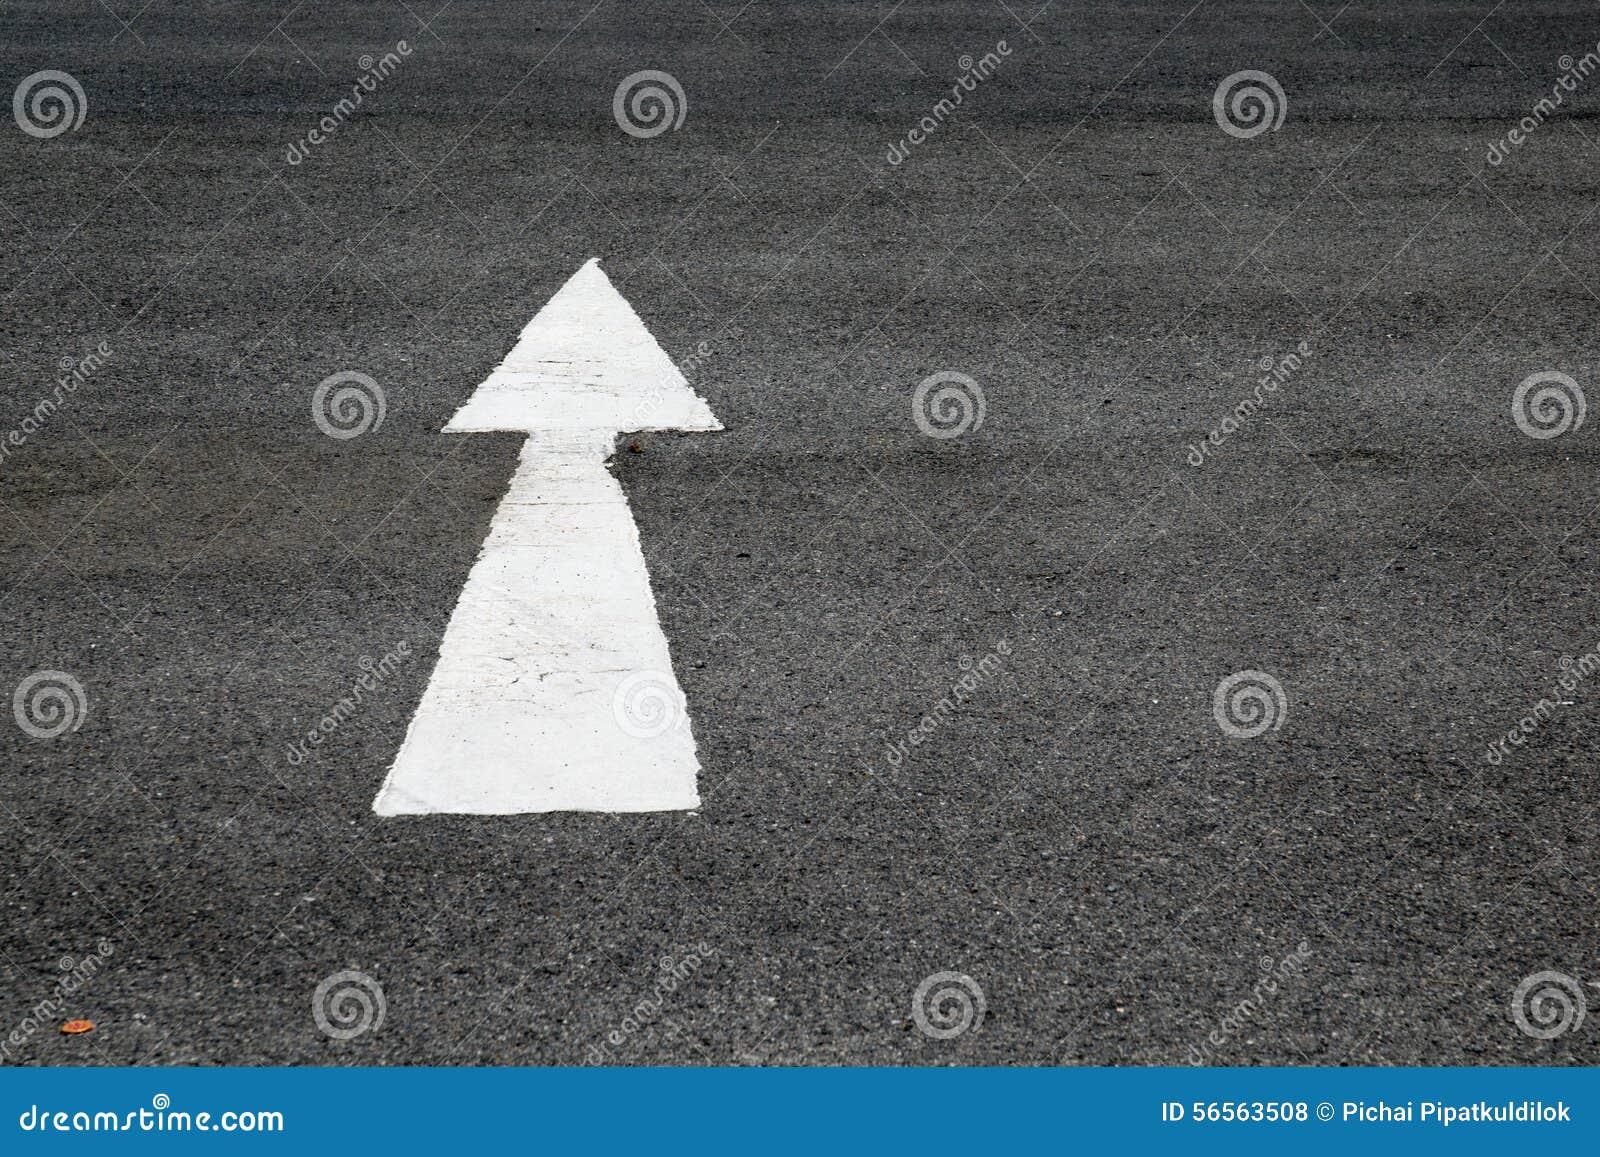 Download Βέλη που χρωματίζονται σε ένα πάτωμα τσιμέντου Στοκ Εικόνες - εικόνα από σύμβολο, σταυροδρόμια: 56563508